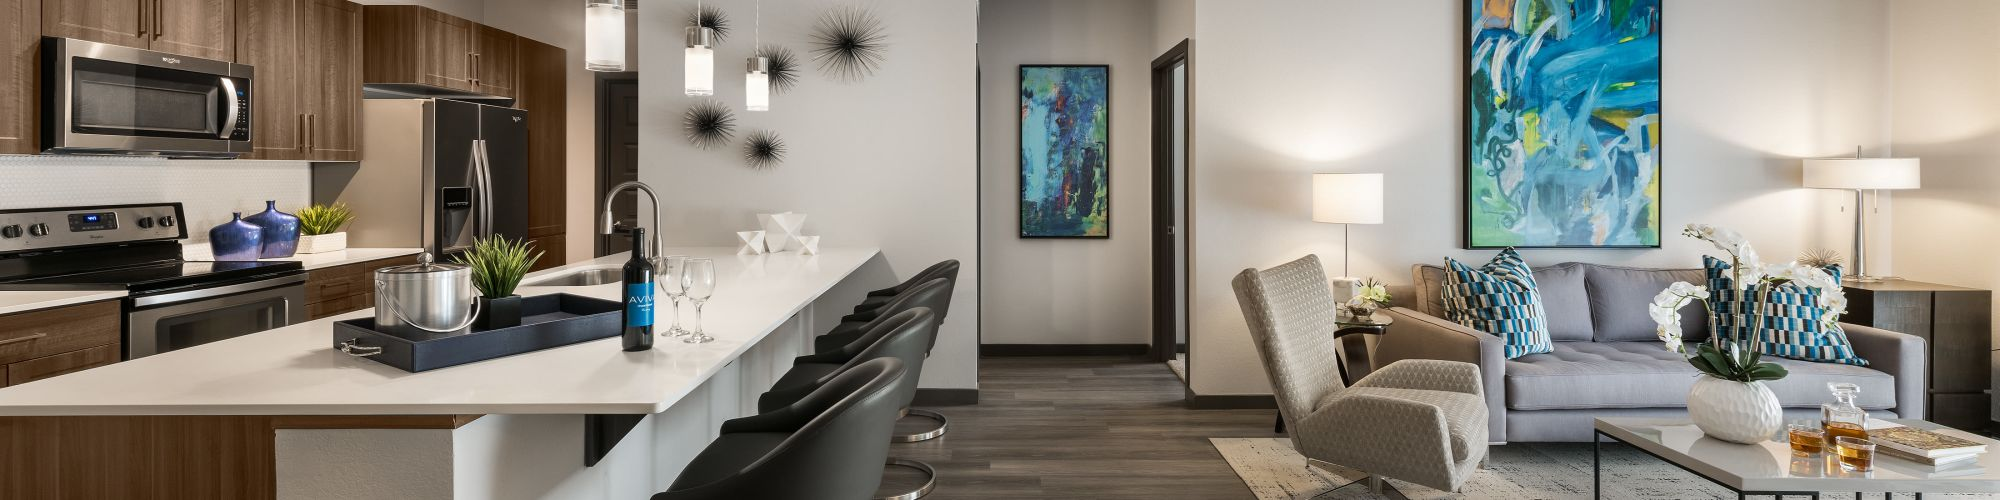 Floor plans at Aviva in Mesa, Arizona